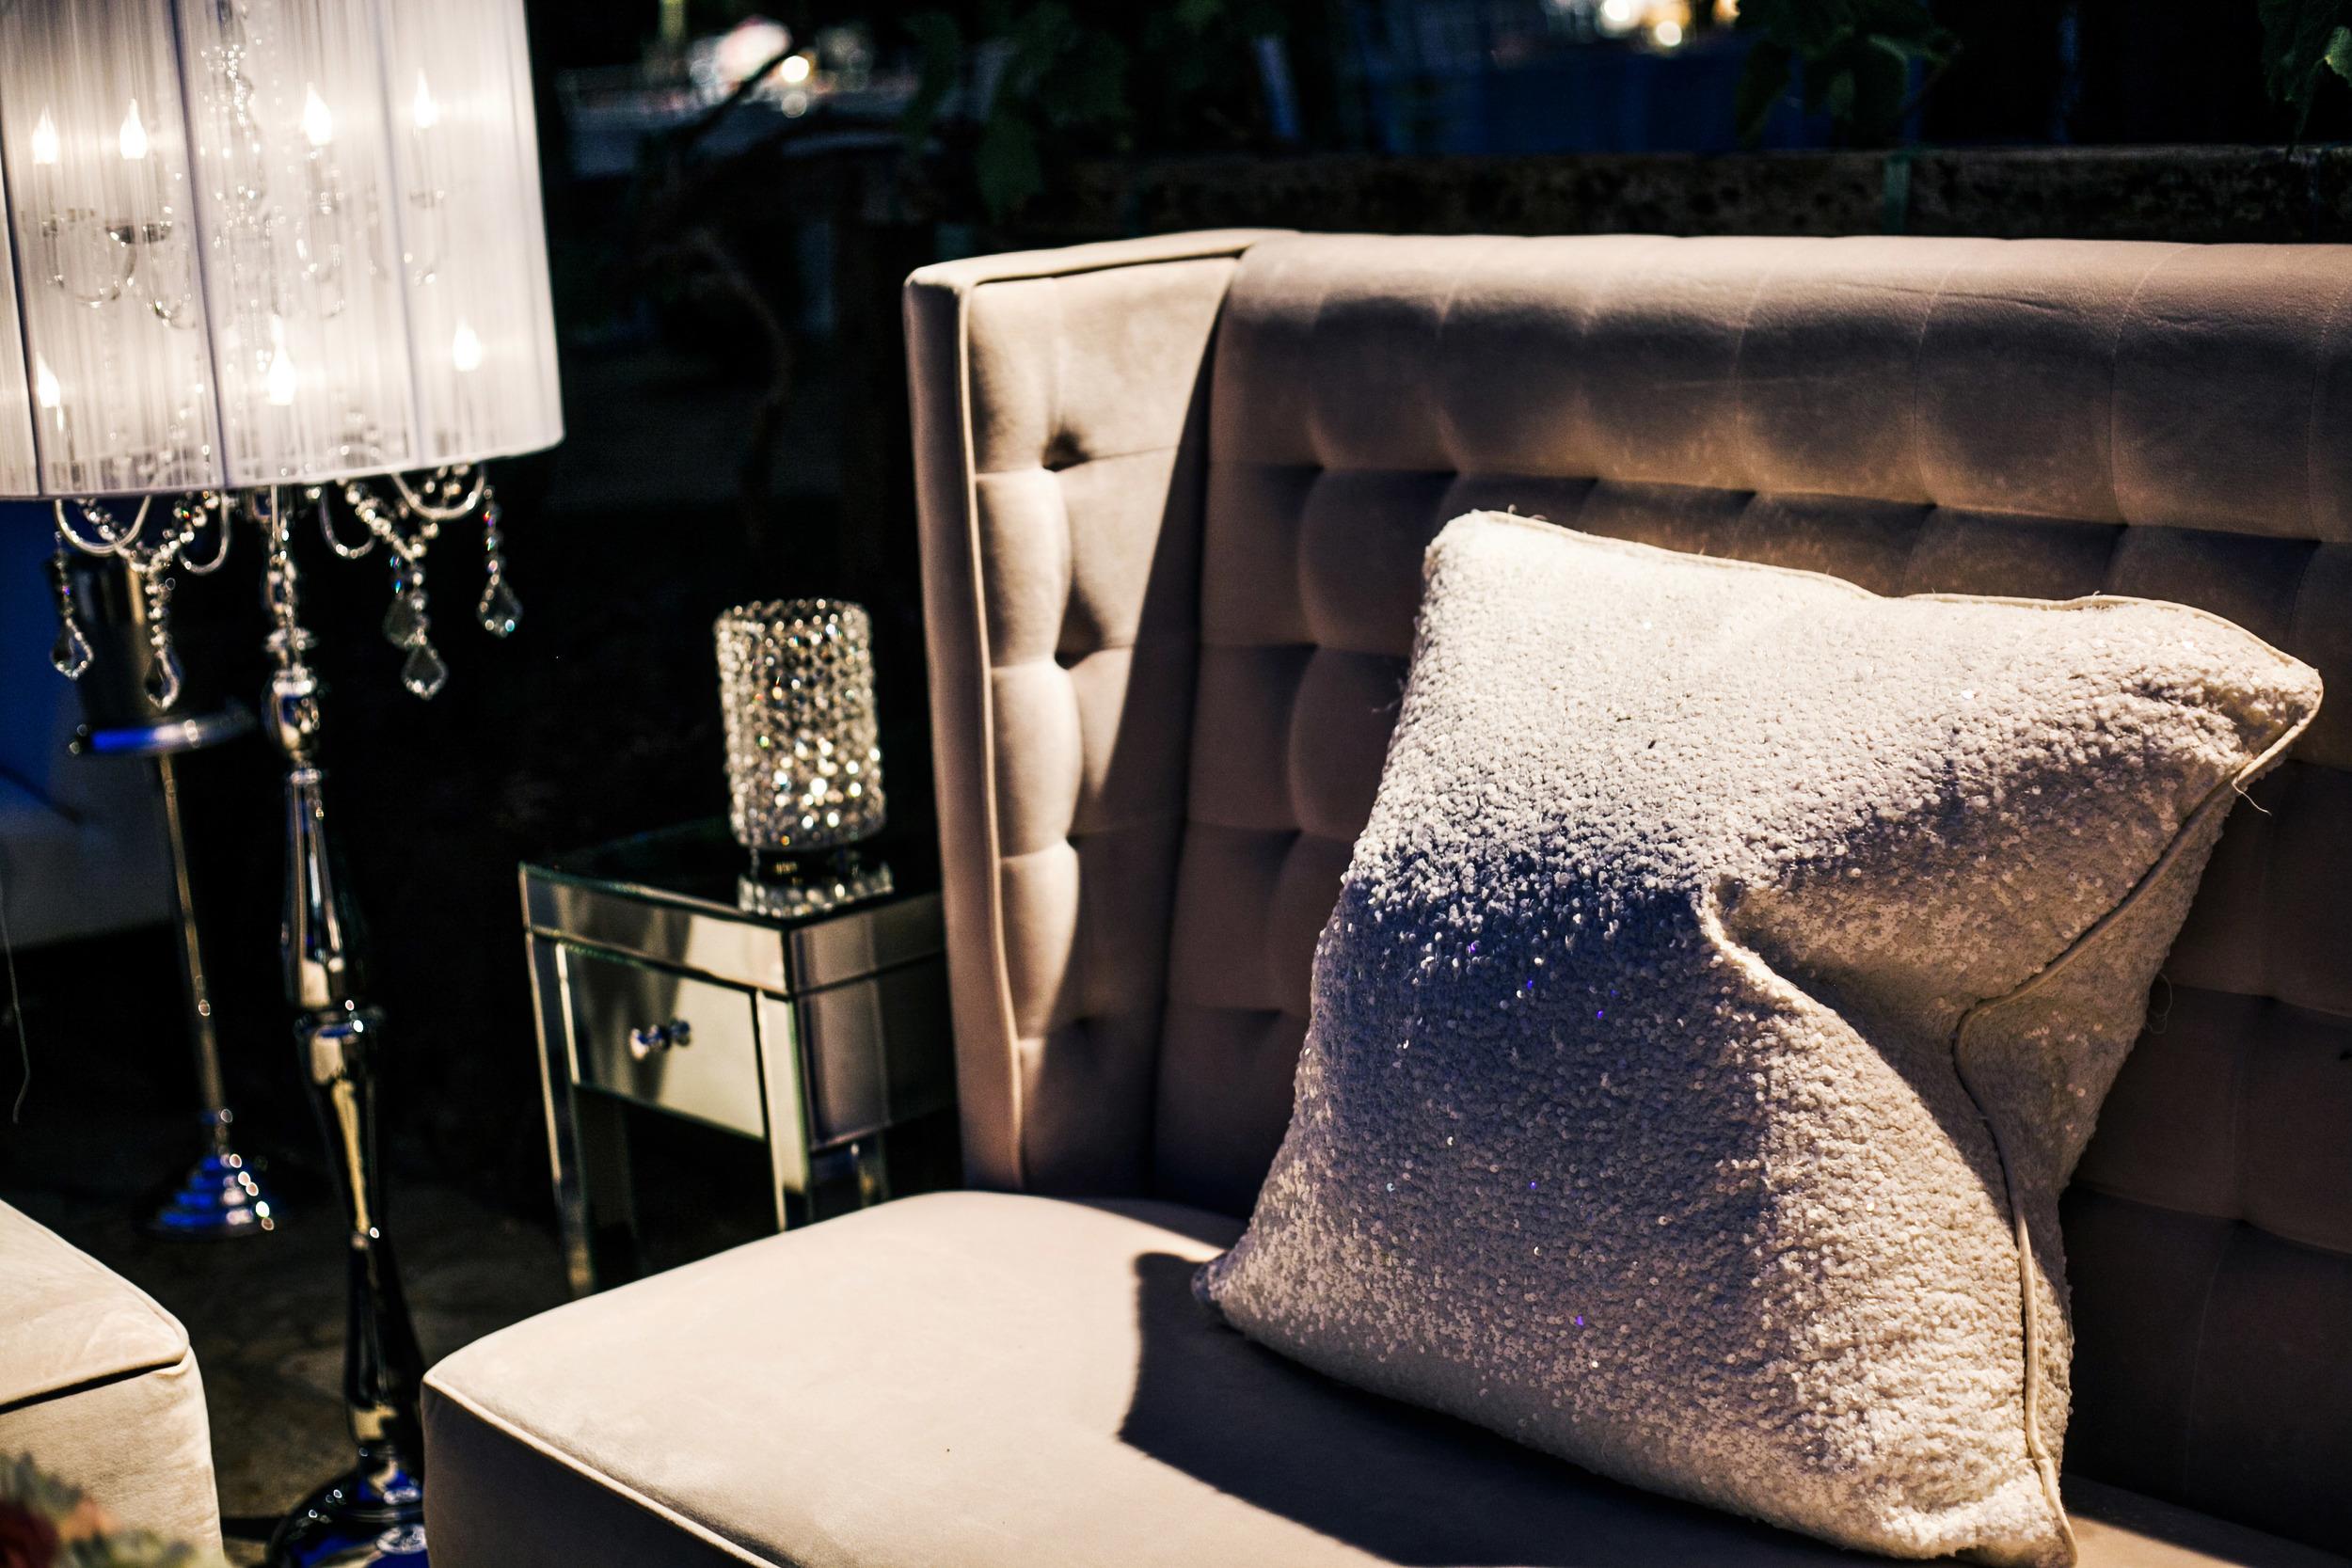 31. modern wedding lounge, sequin pillows, crystal lamps, summer wedding, ivory & white wedding lounge.jpg